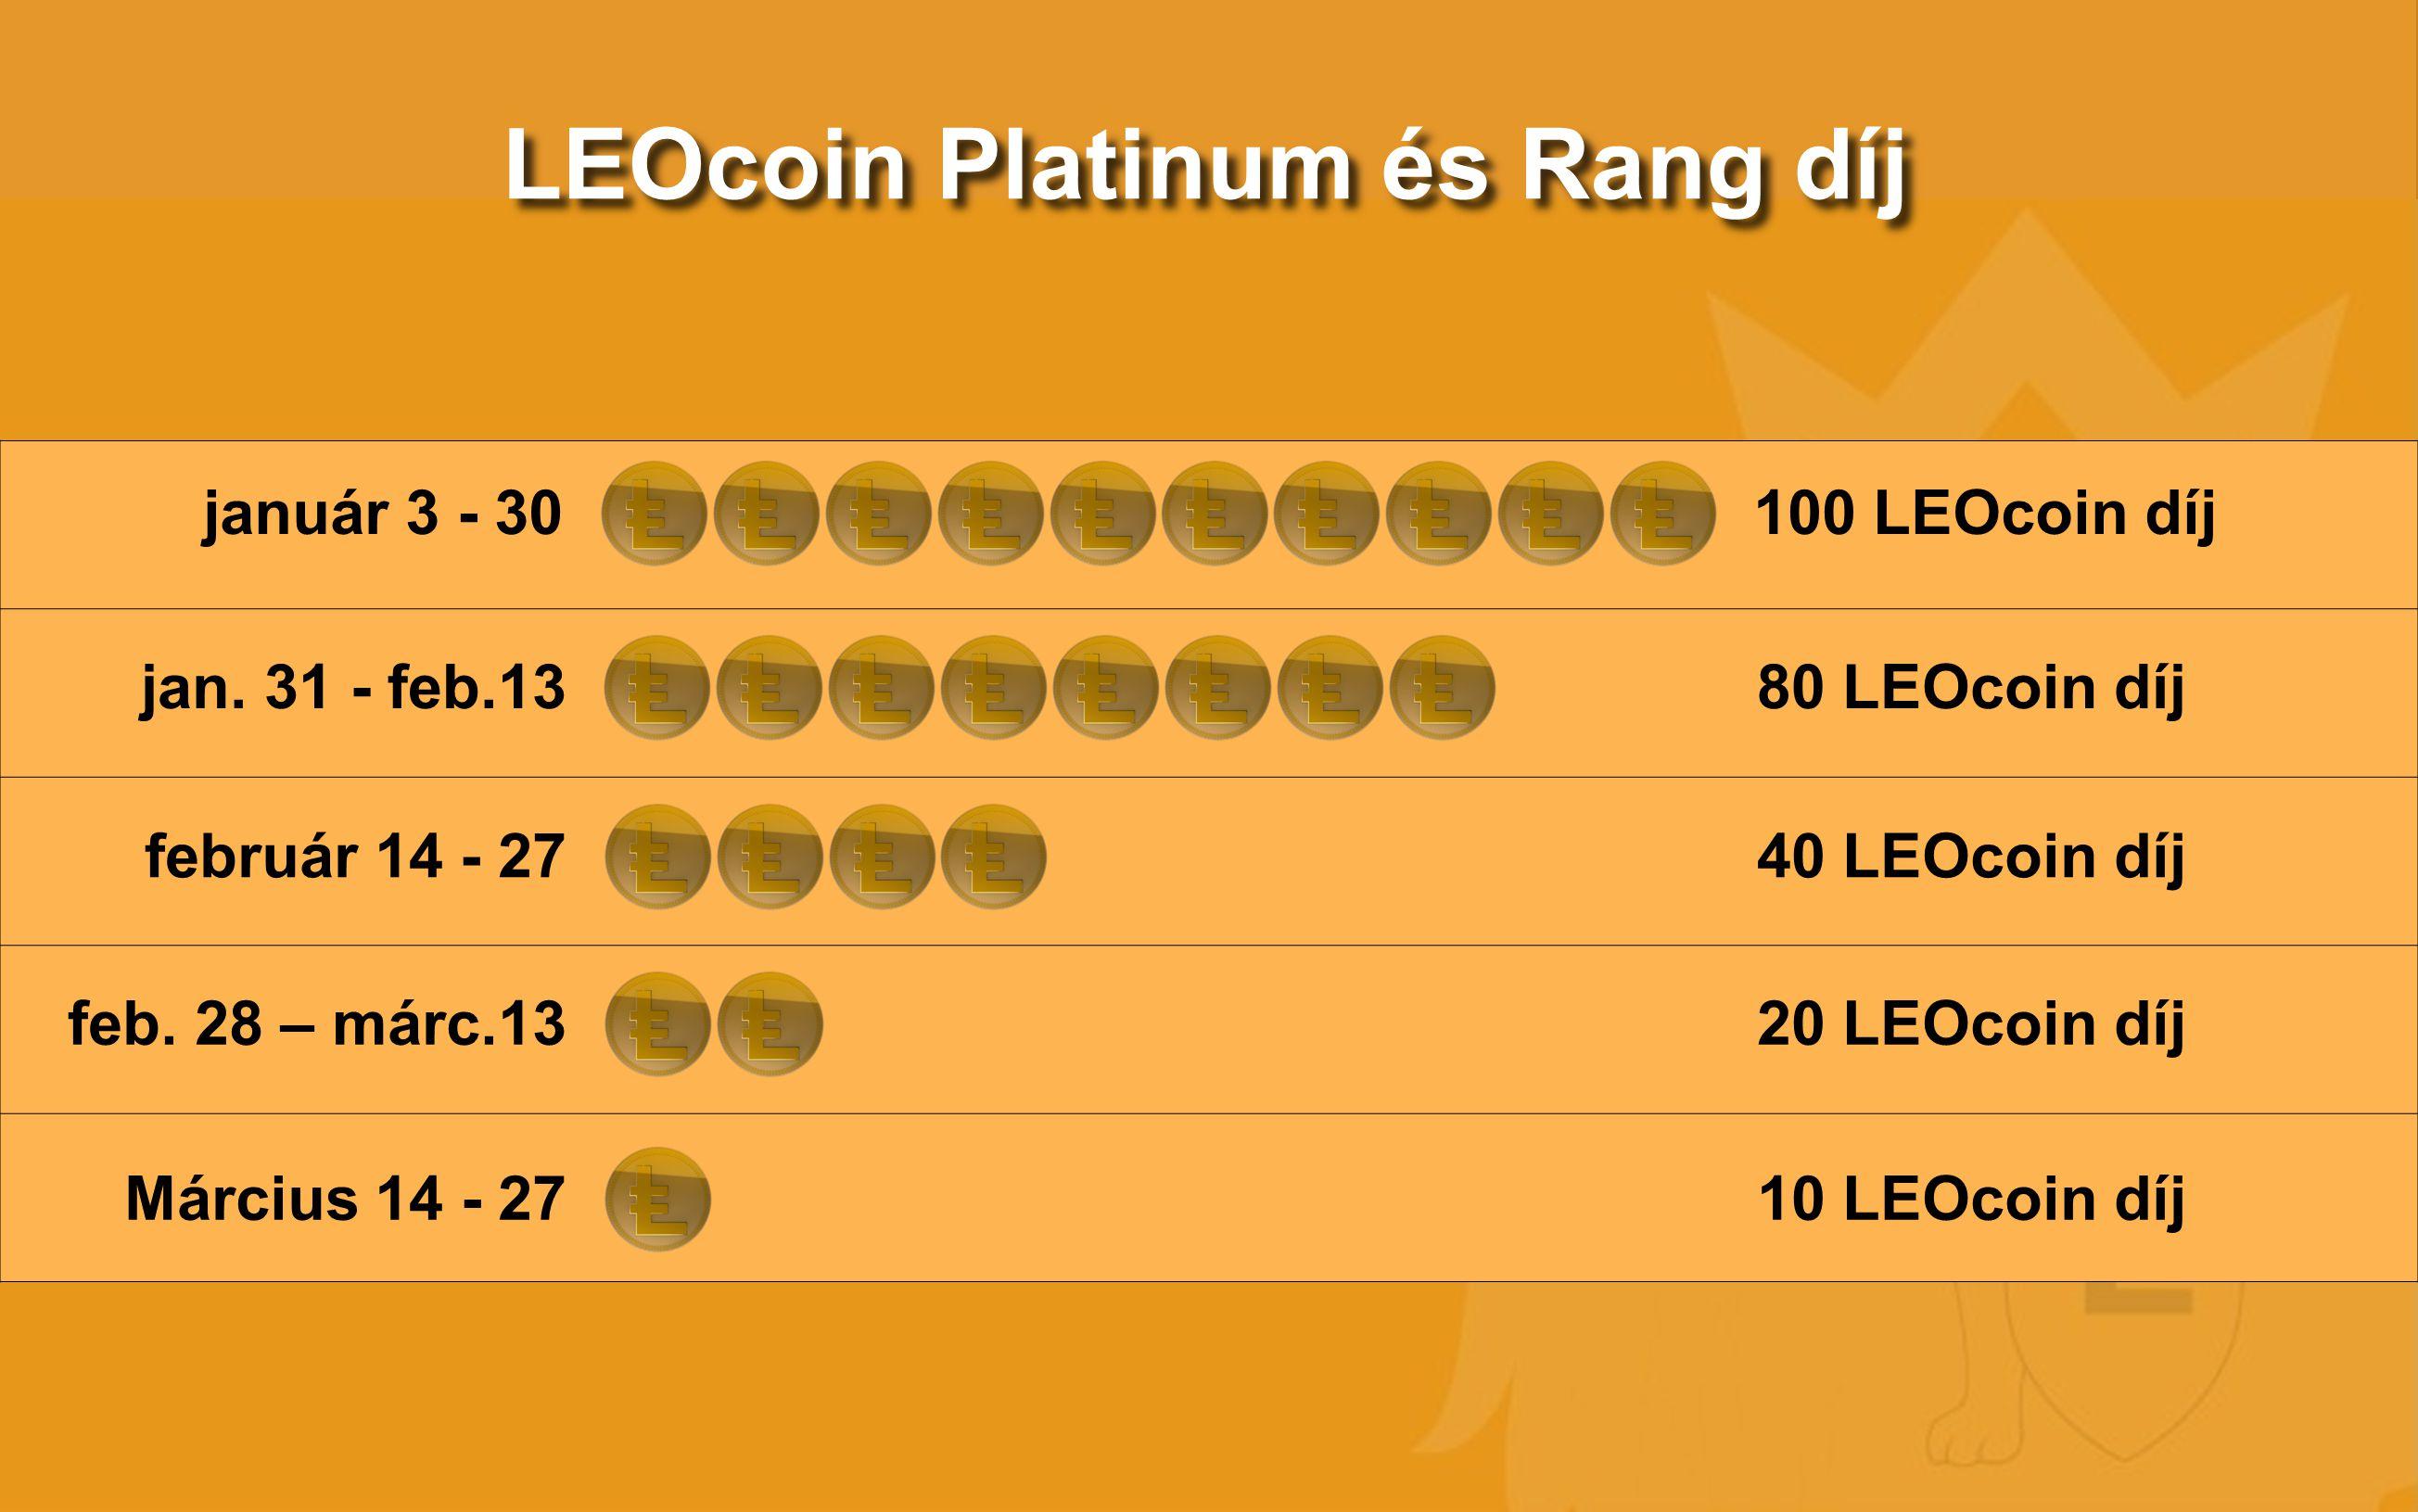 január 3 - 30100 LEOcoin díj jan.31 - feb.1380 LEOcoin díj február 14 - 2740 LEOcoin díj feb.